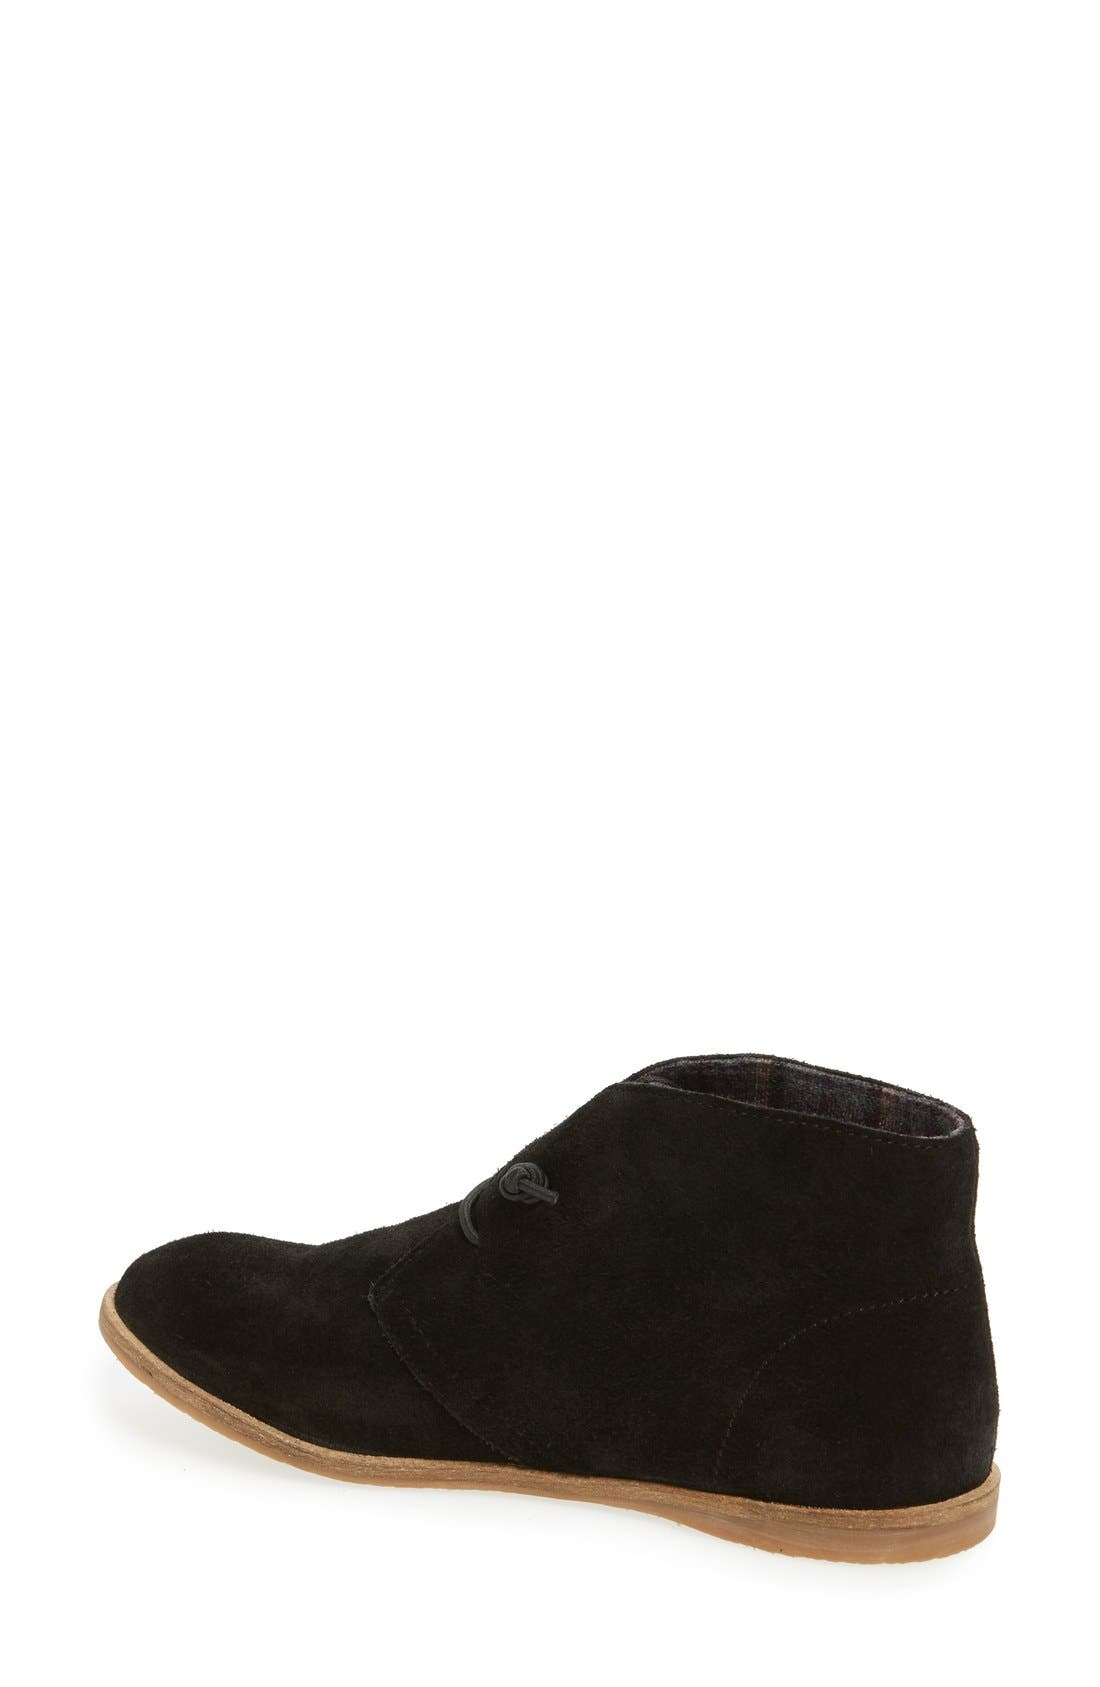 Alternate Image 2  - Lucky Brand 'Ashbee' Chukka Boot (Women)